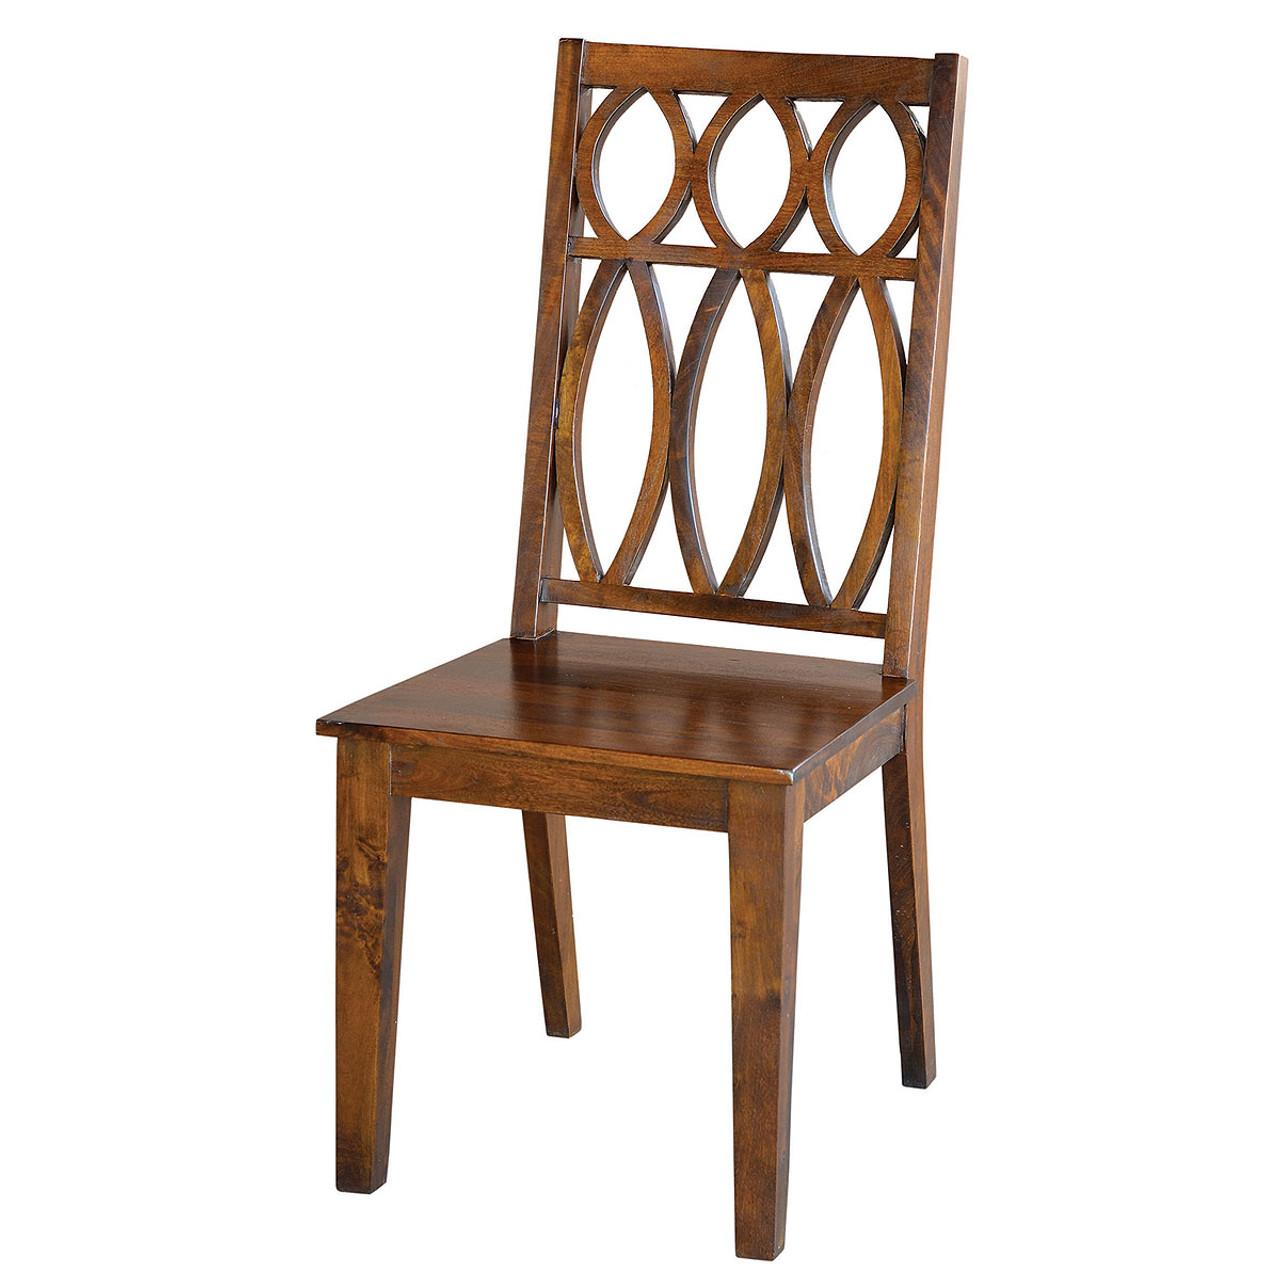 Magnolia Dining Chair Dark Oak Zin Home : Solidmangowoodhighbackdiningroomchair051121371688351 from www.zinhome.com size 1200 x 1200 jpeg 166kB